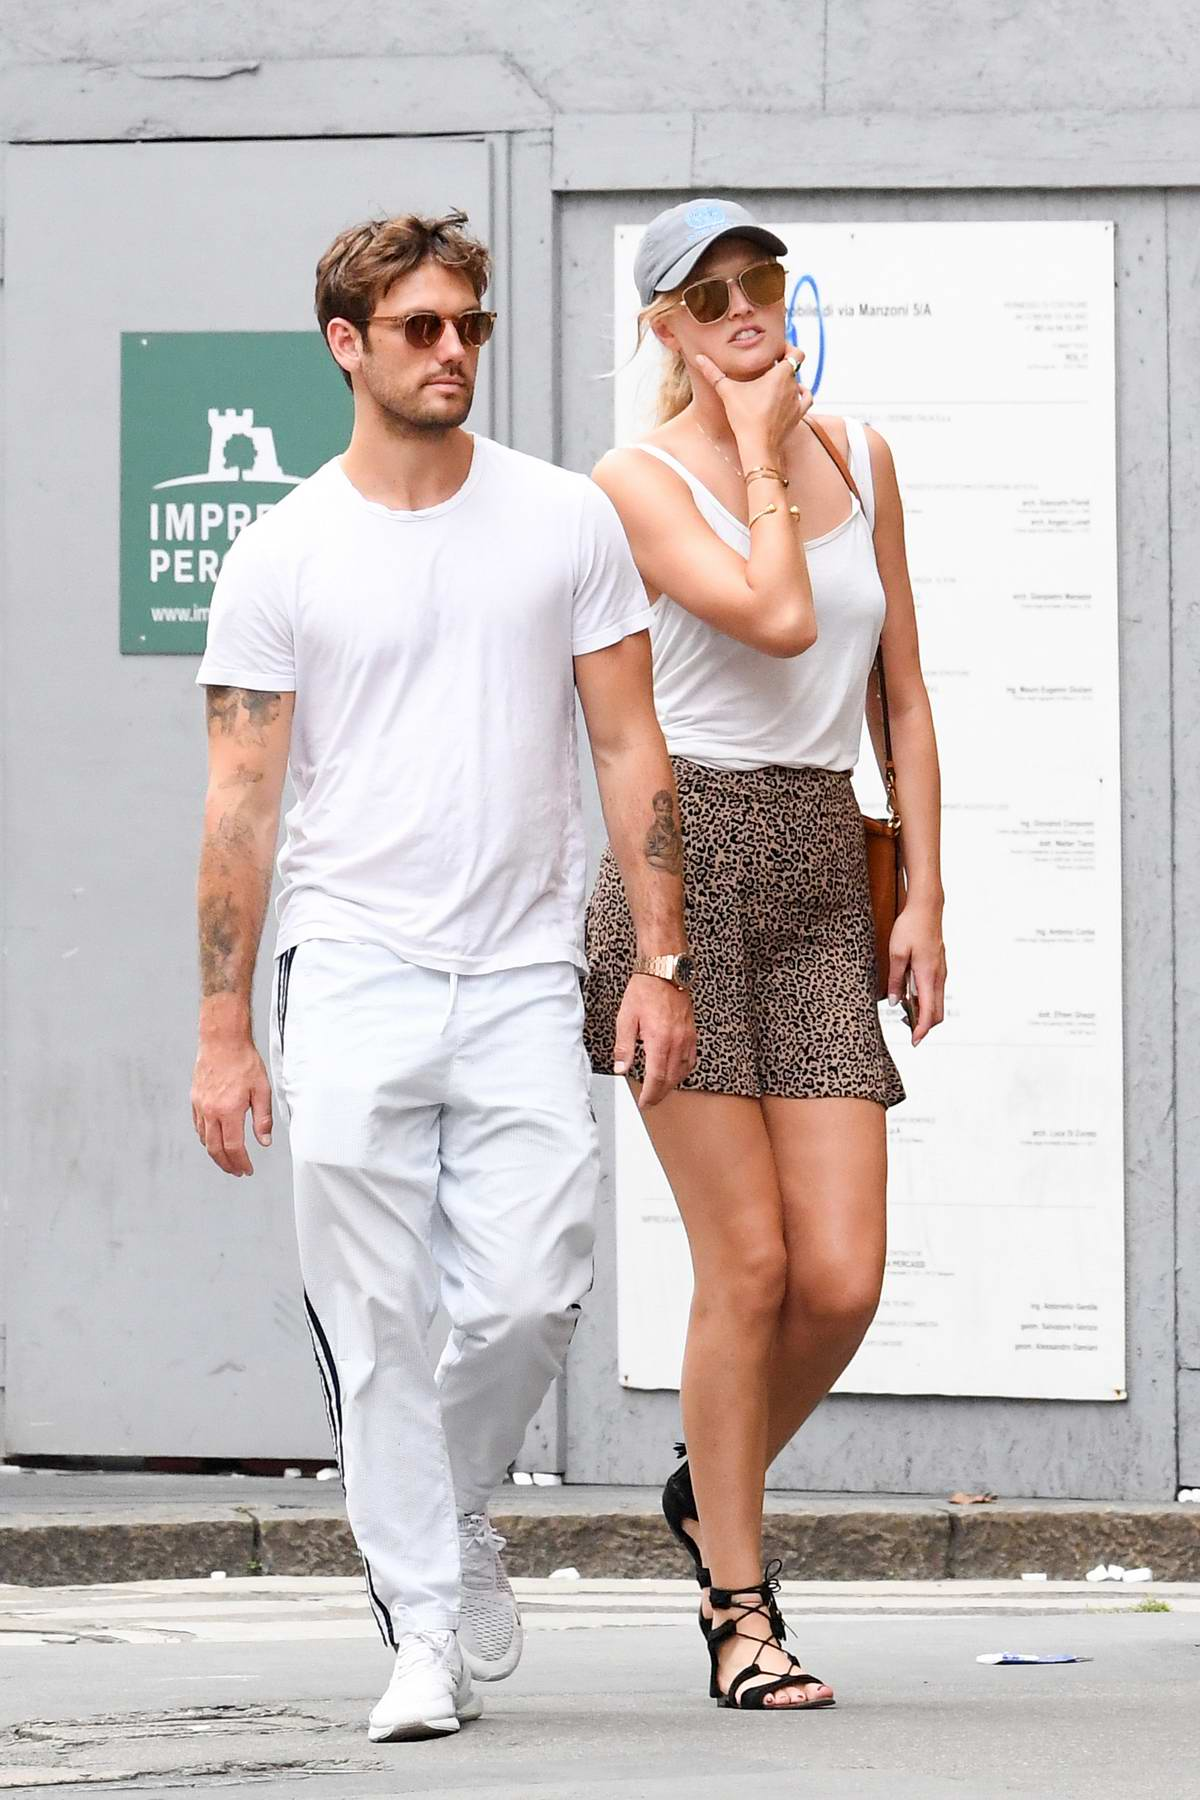 Toni Garrn and boyfriend Alex Pettyfer step out in Milan, Italy